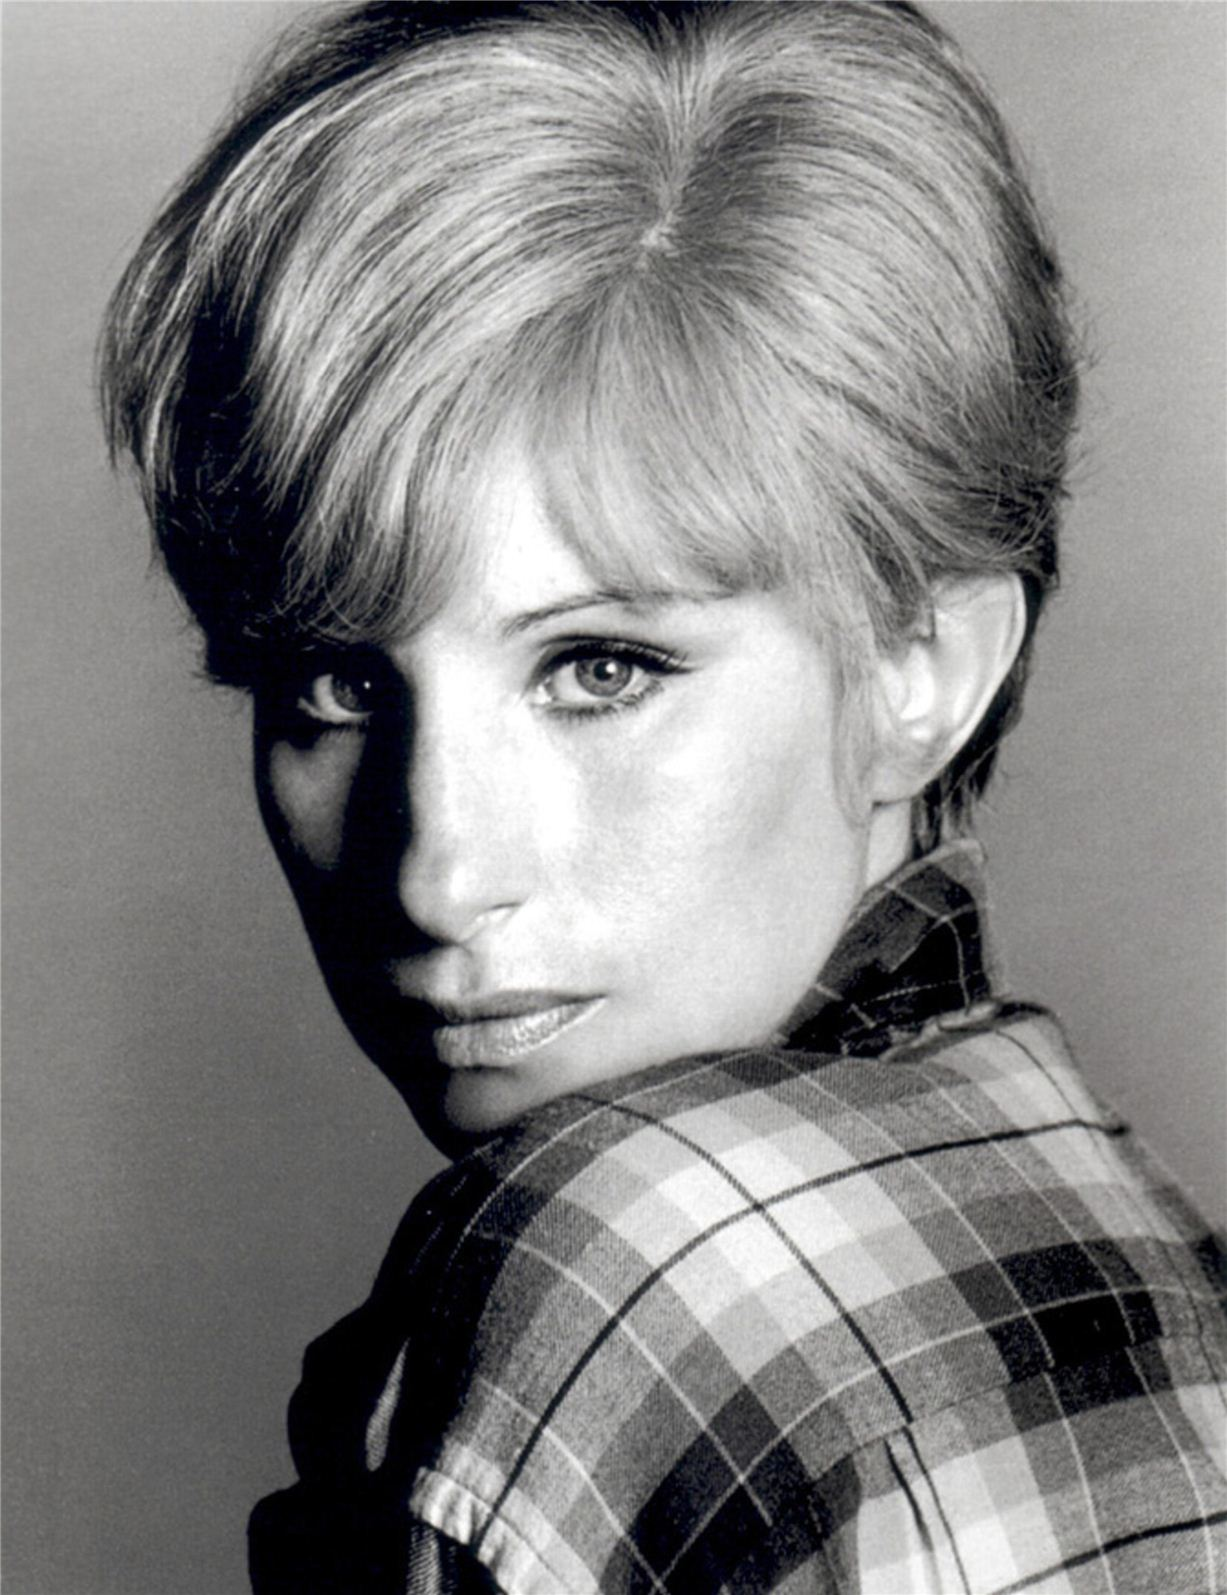 Barbra Streisand / Барбра Стрейзанд - портрет фотографа Грега Гормана / Greg Gorman